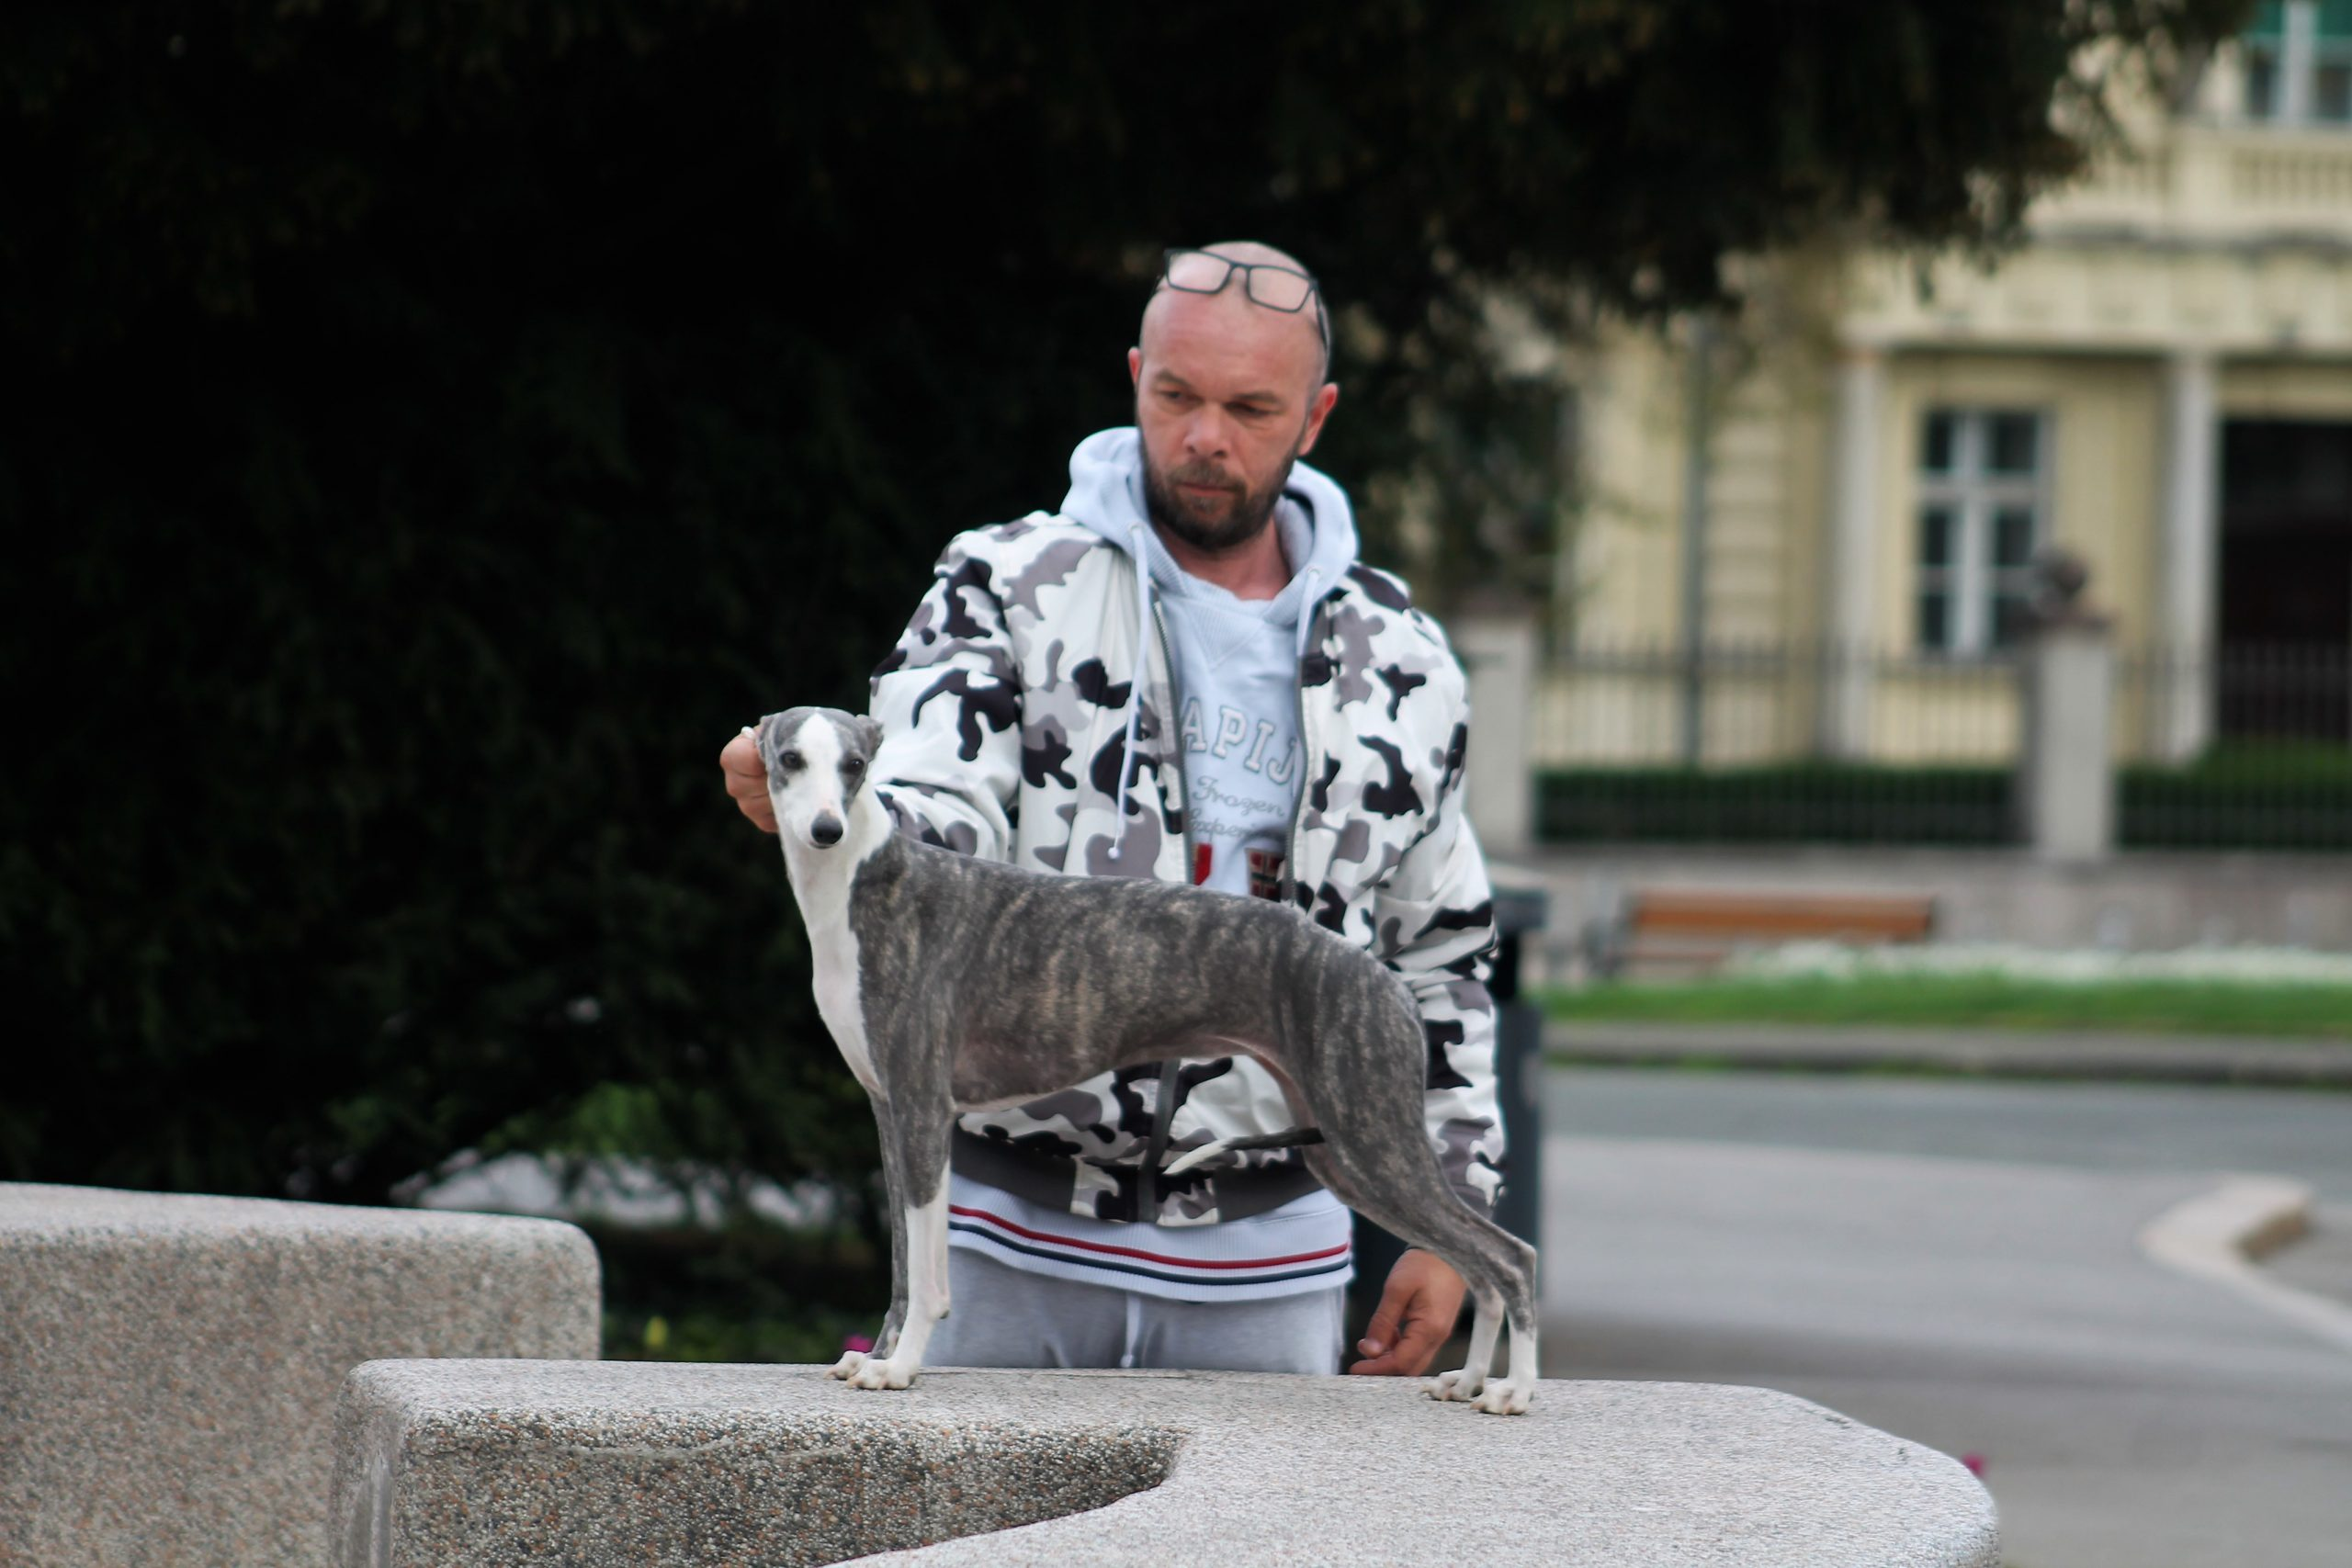 Foto: Nataša KOVAČIĆ